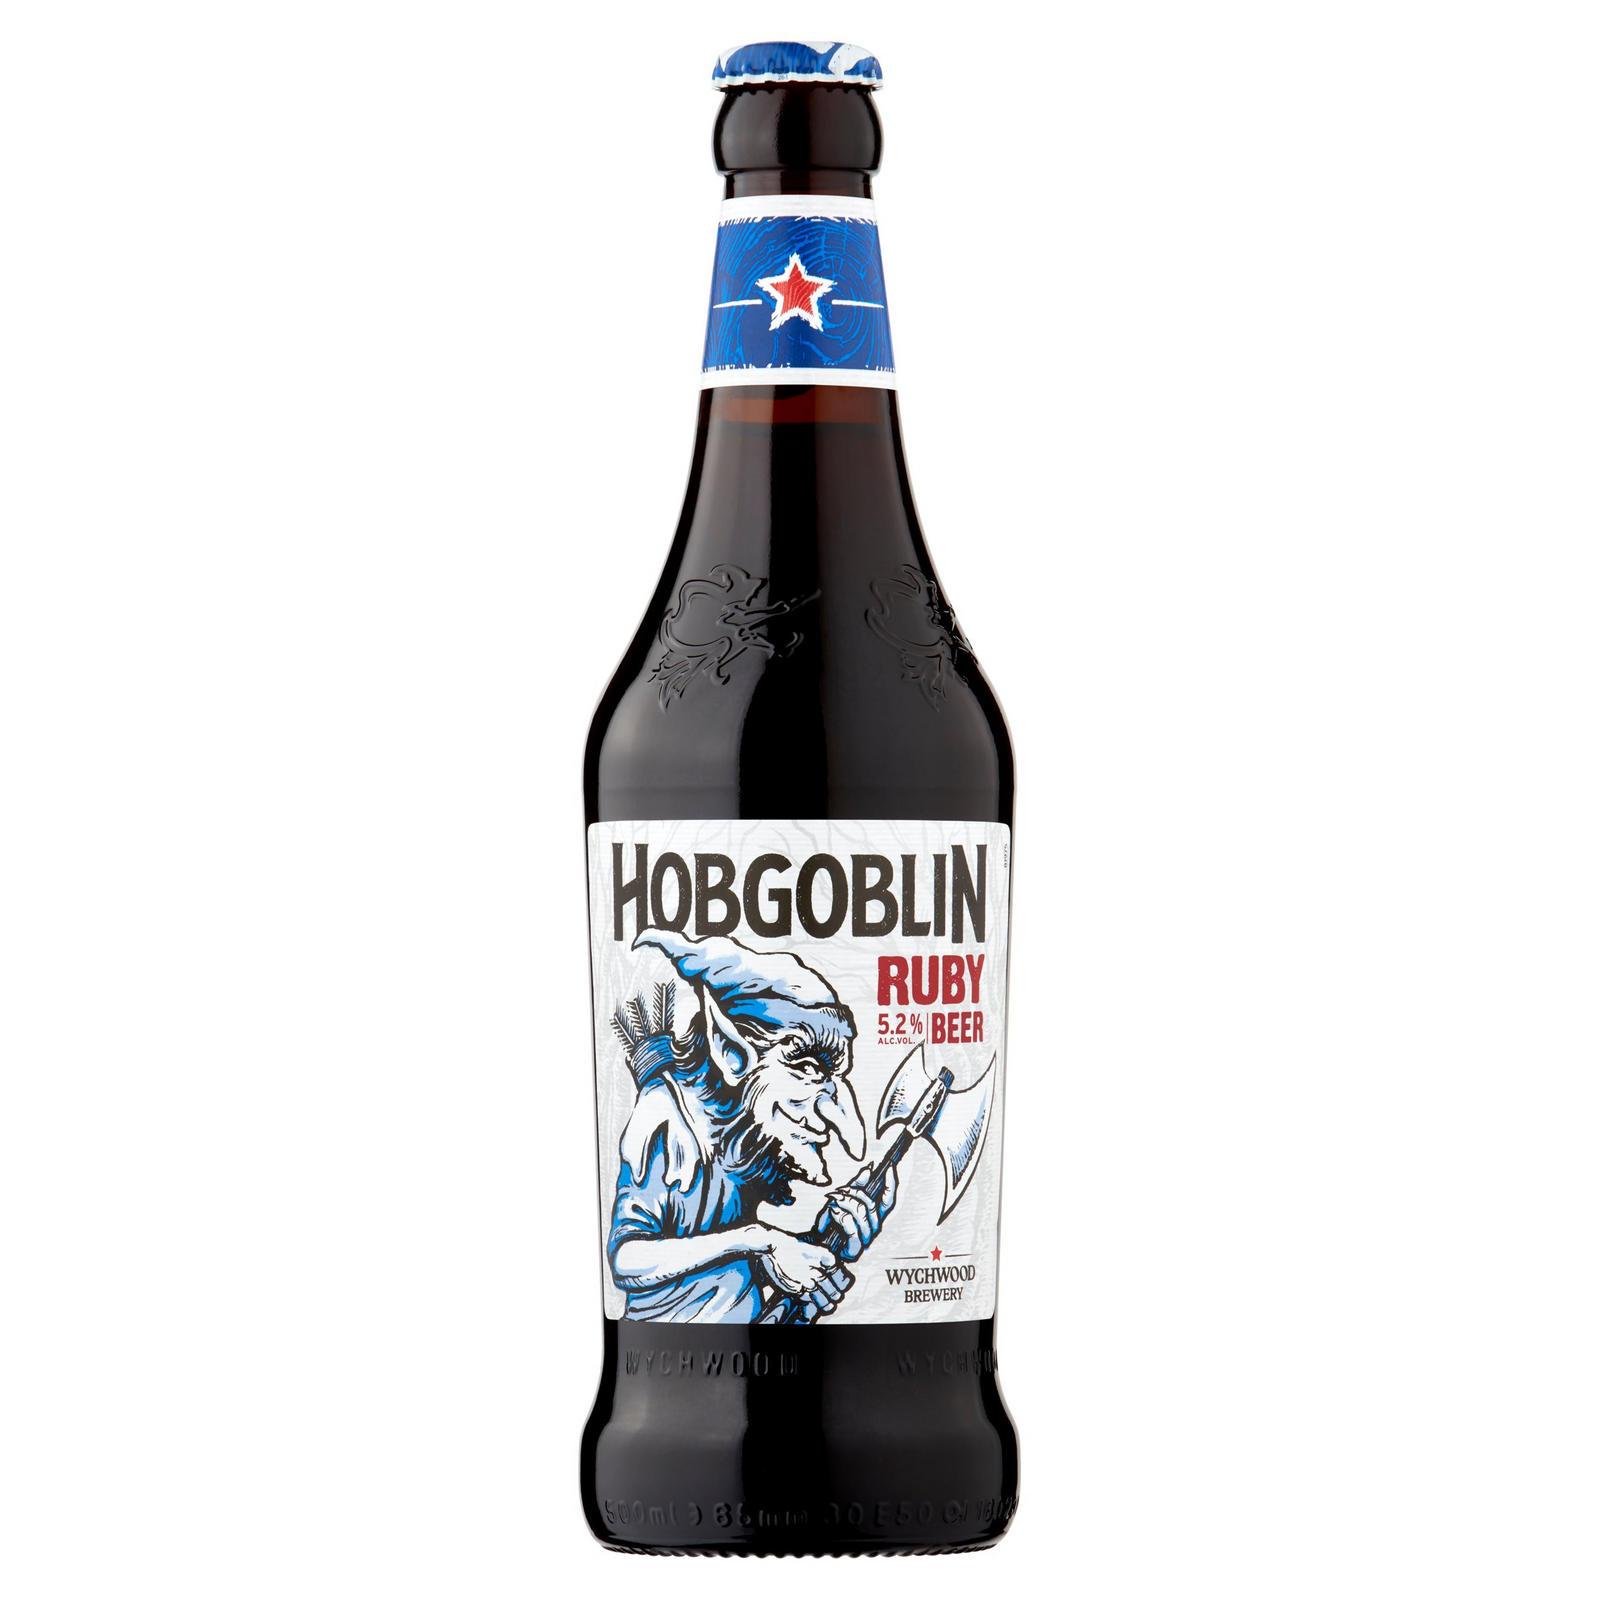 Hobgoblin Ruby ale 500ml bottles, 67p at Asda Milton Keynes